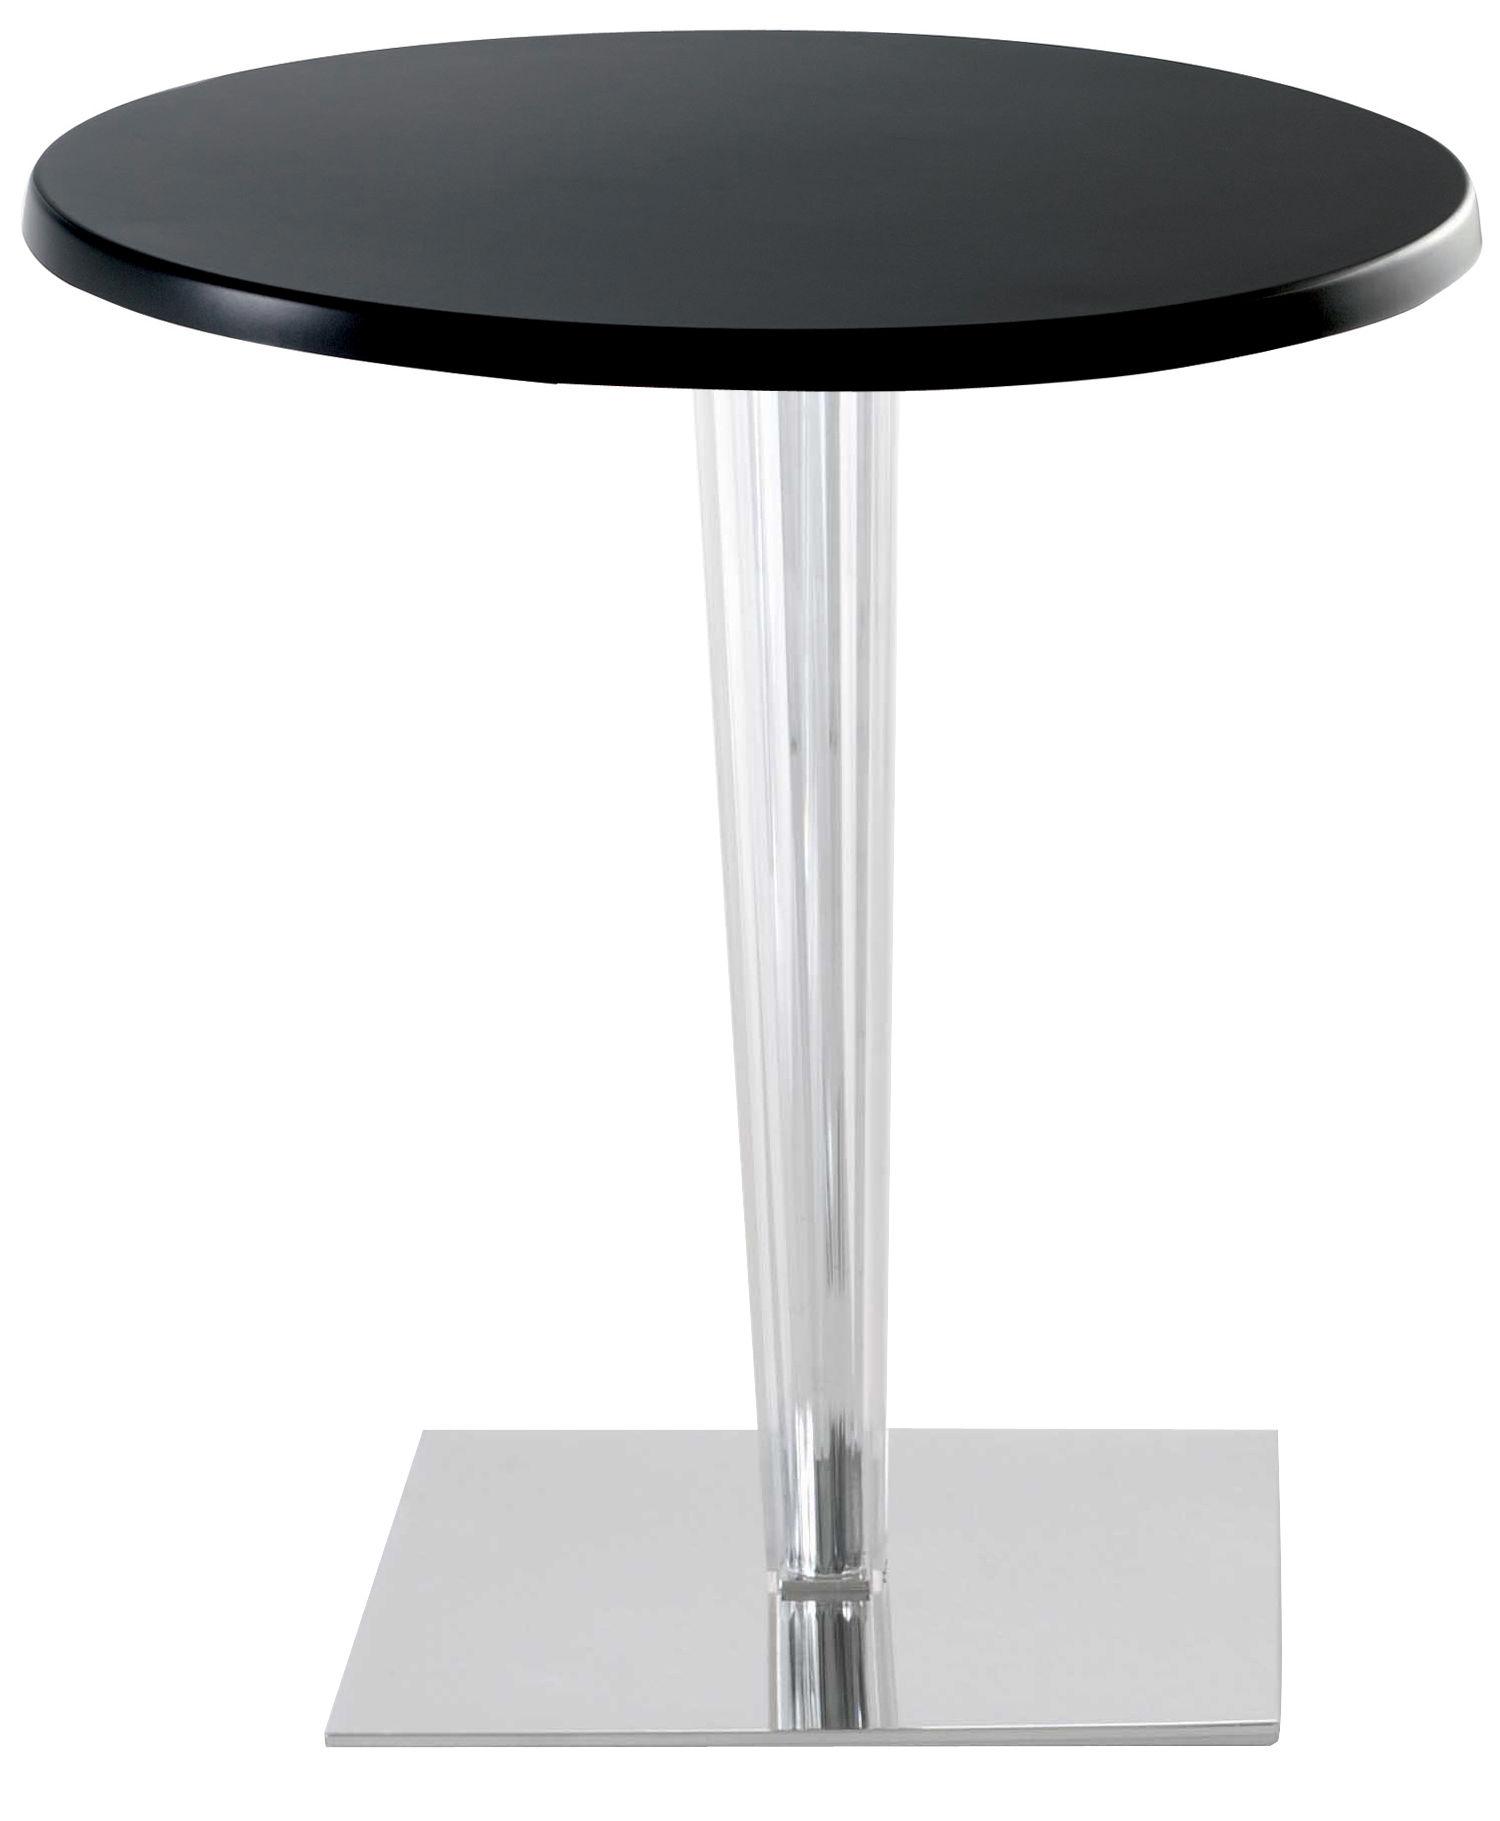 Top top contract outdoor garden table round table top for Table 60x60 design